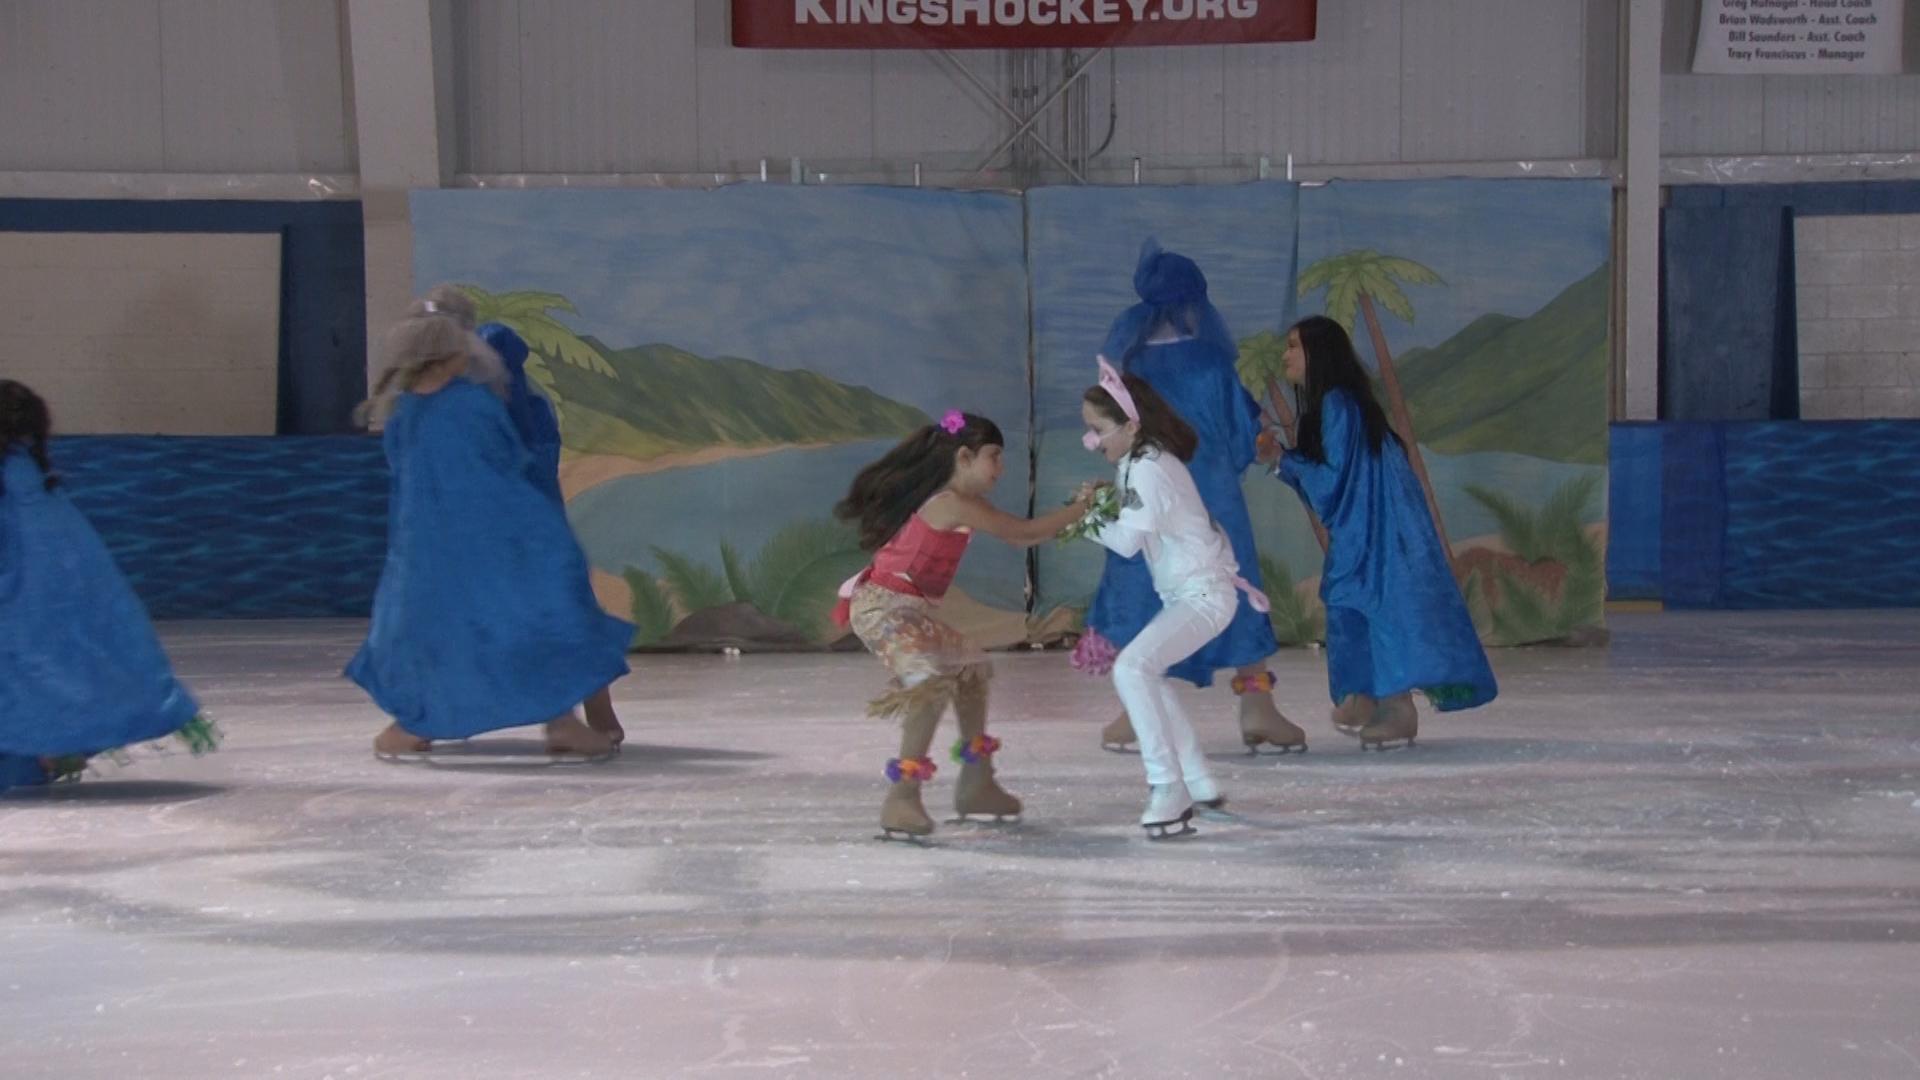 Power Play Maui Skate on Ice 071417.00_07_32_28.Still009.jpg